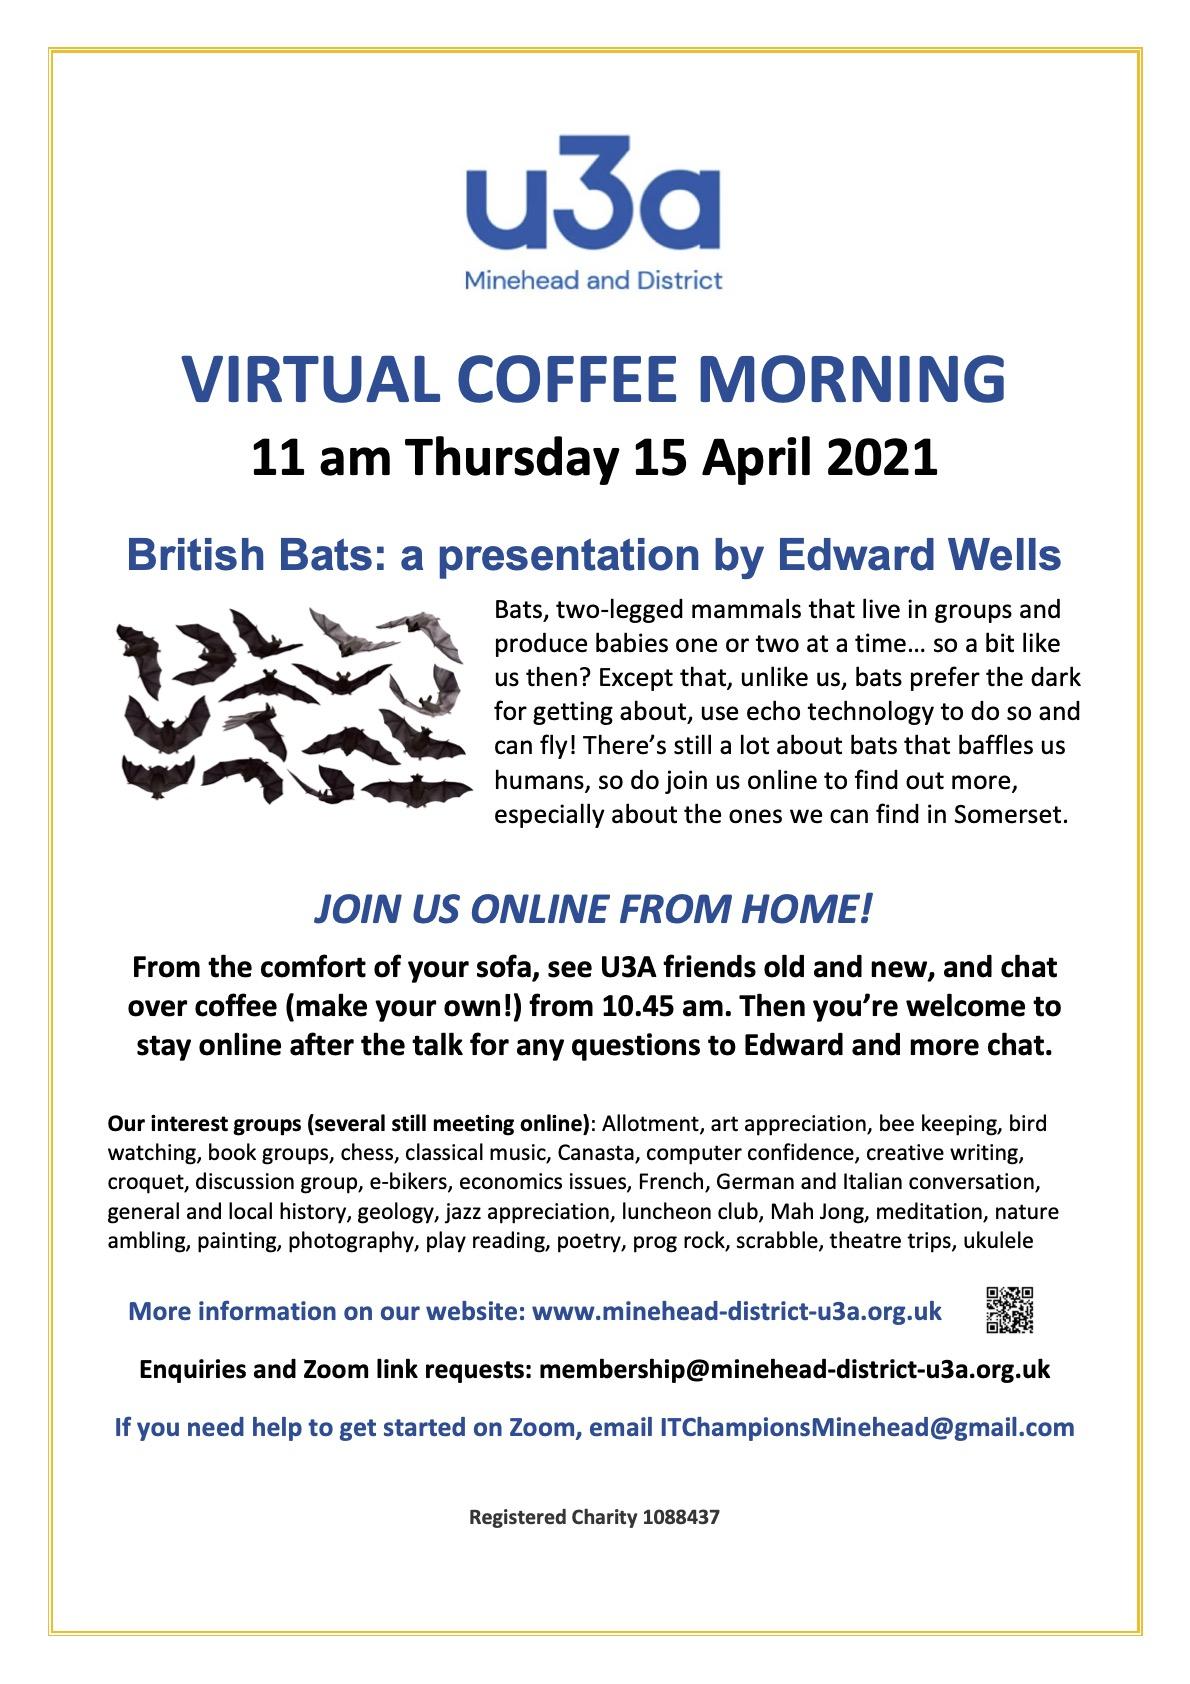 U3A Coffee Morning Poster April 2021